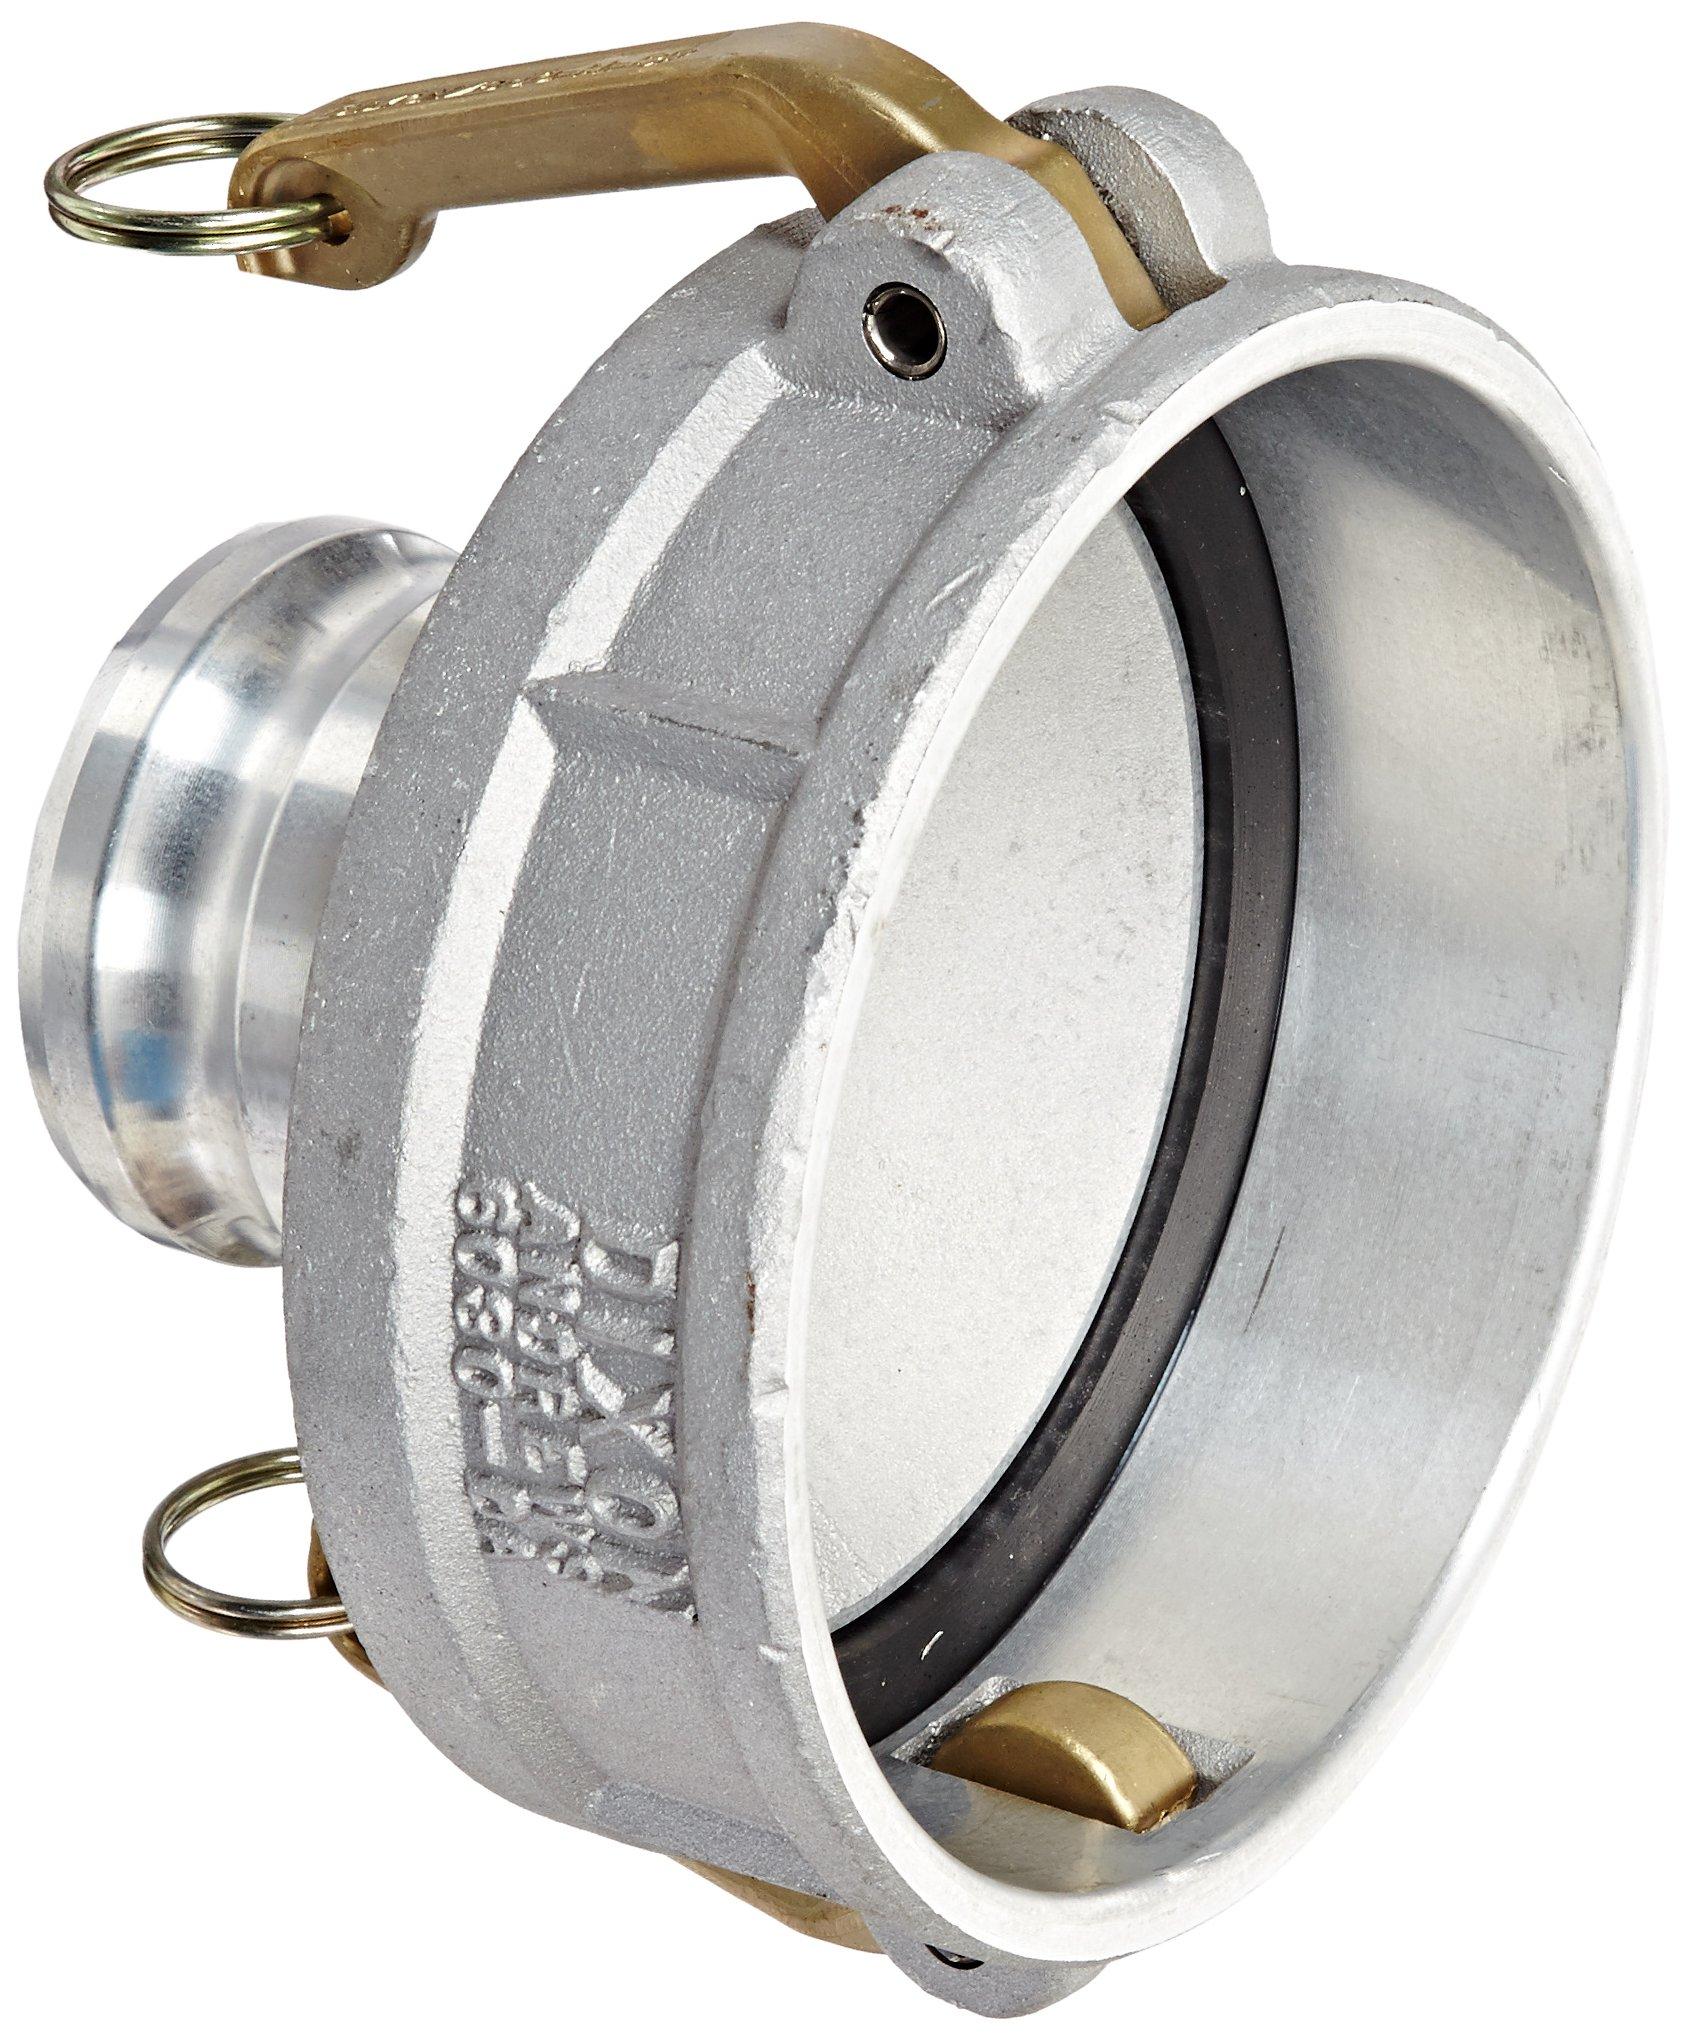 Dixon 6030-DA-AL Aluminum Cam and Groove Reducing Hose Fitting, 6'' Socket x 3'' Plug